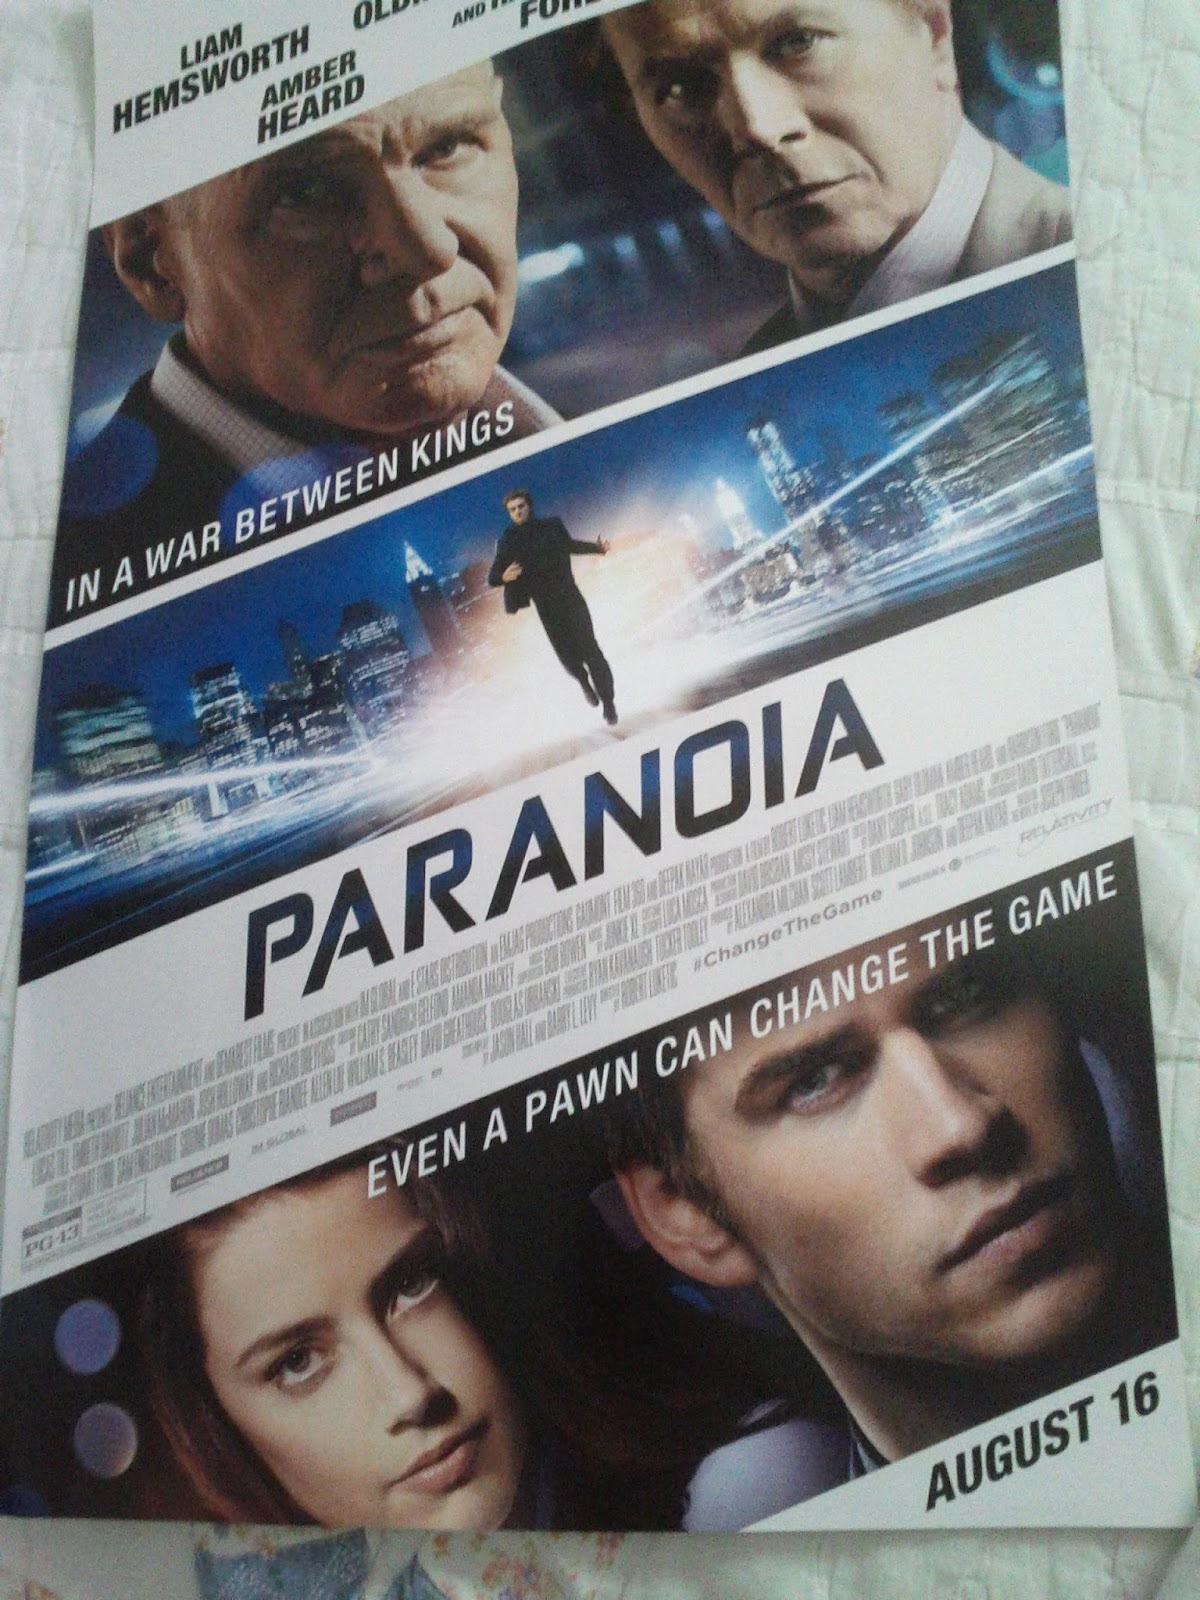 jennifer lawrence fansite paranoia film poster giveaway